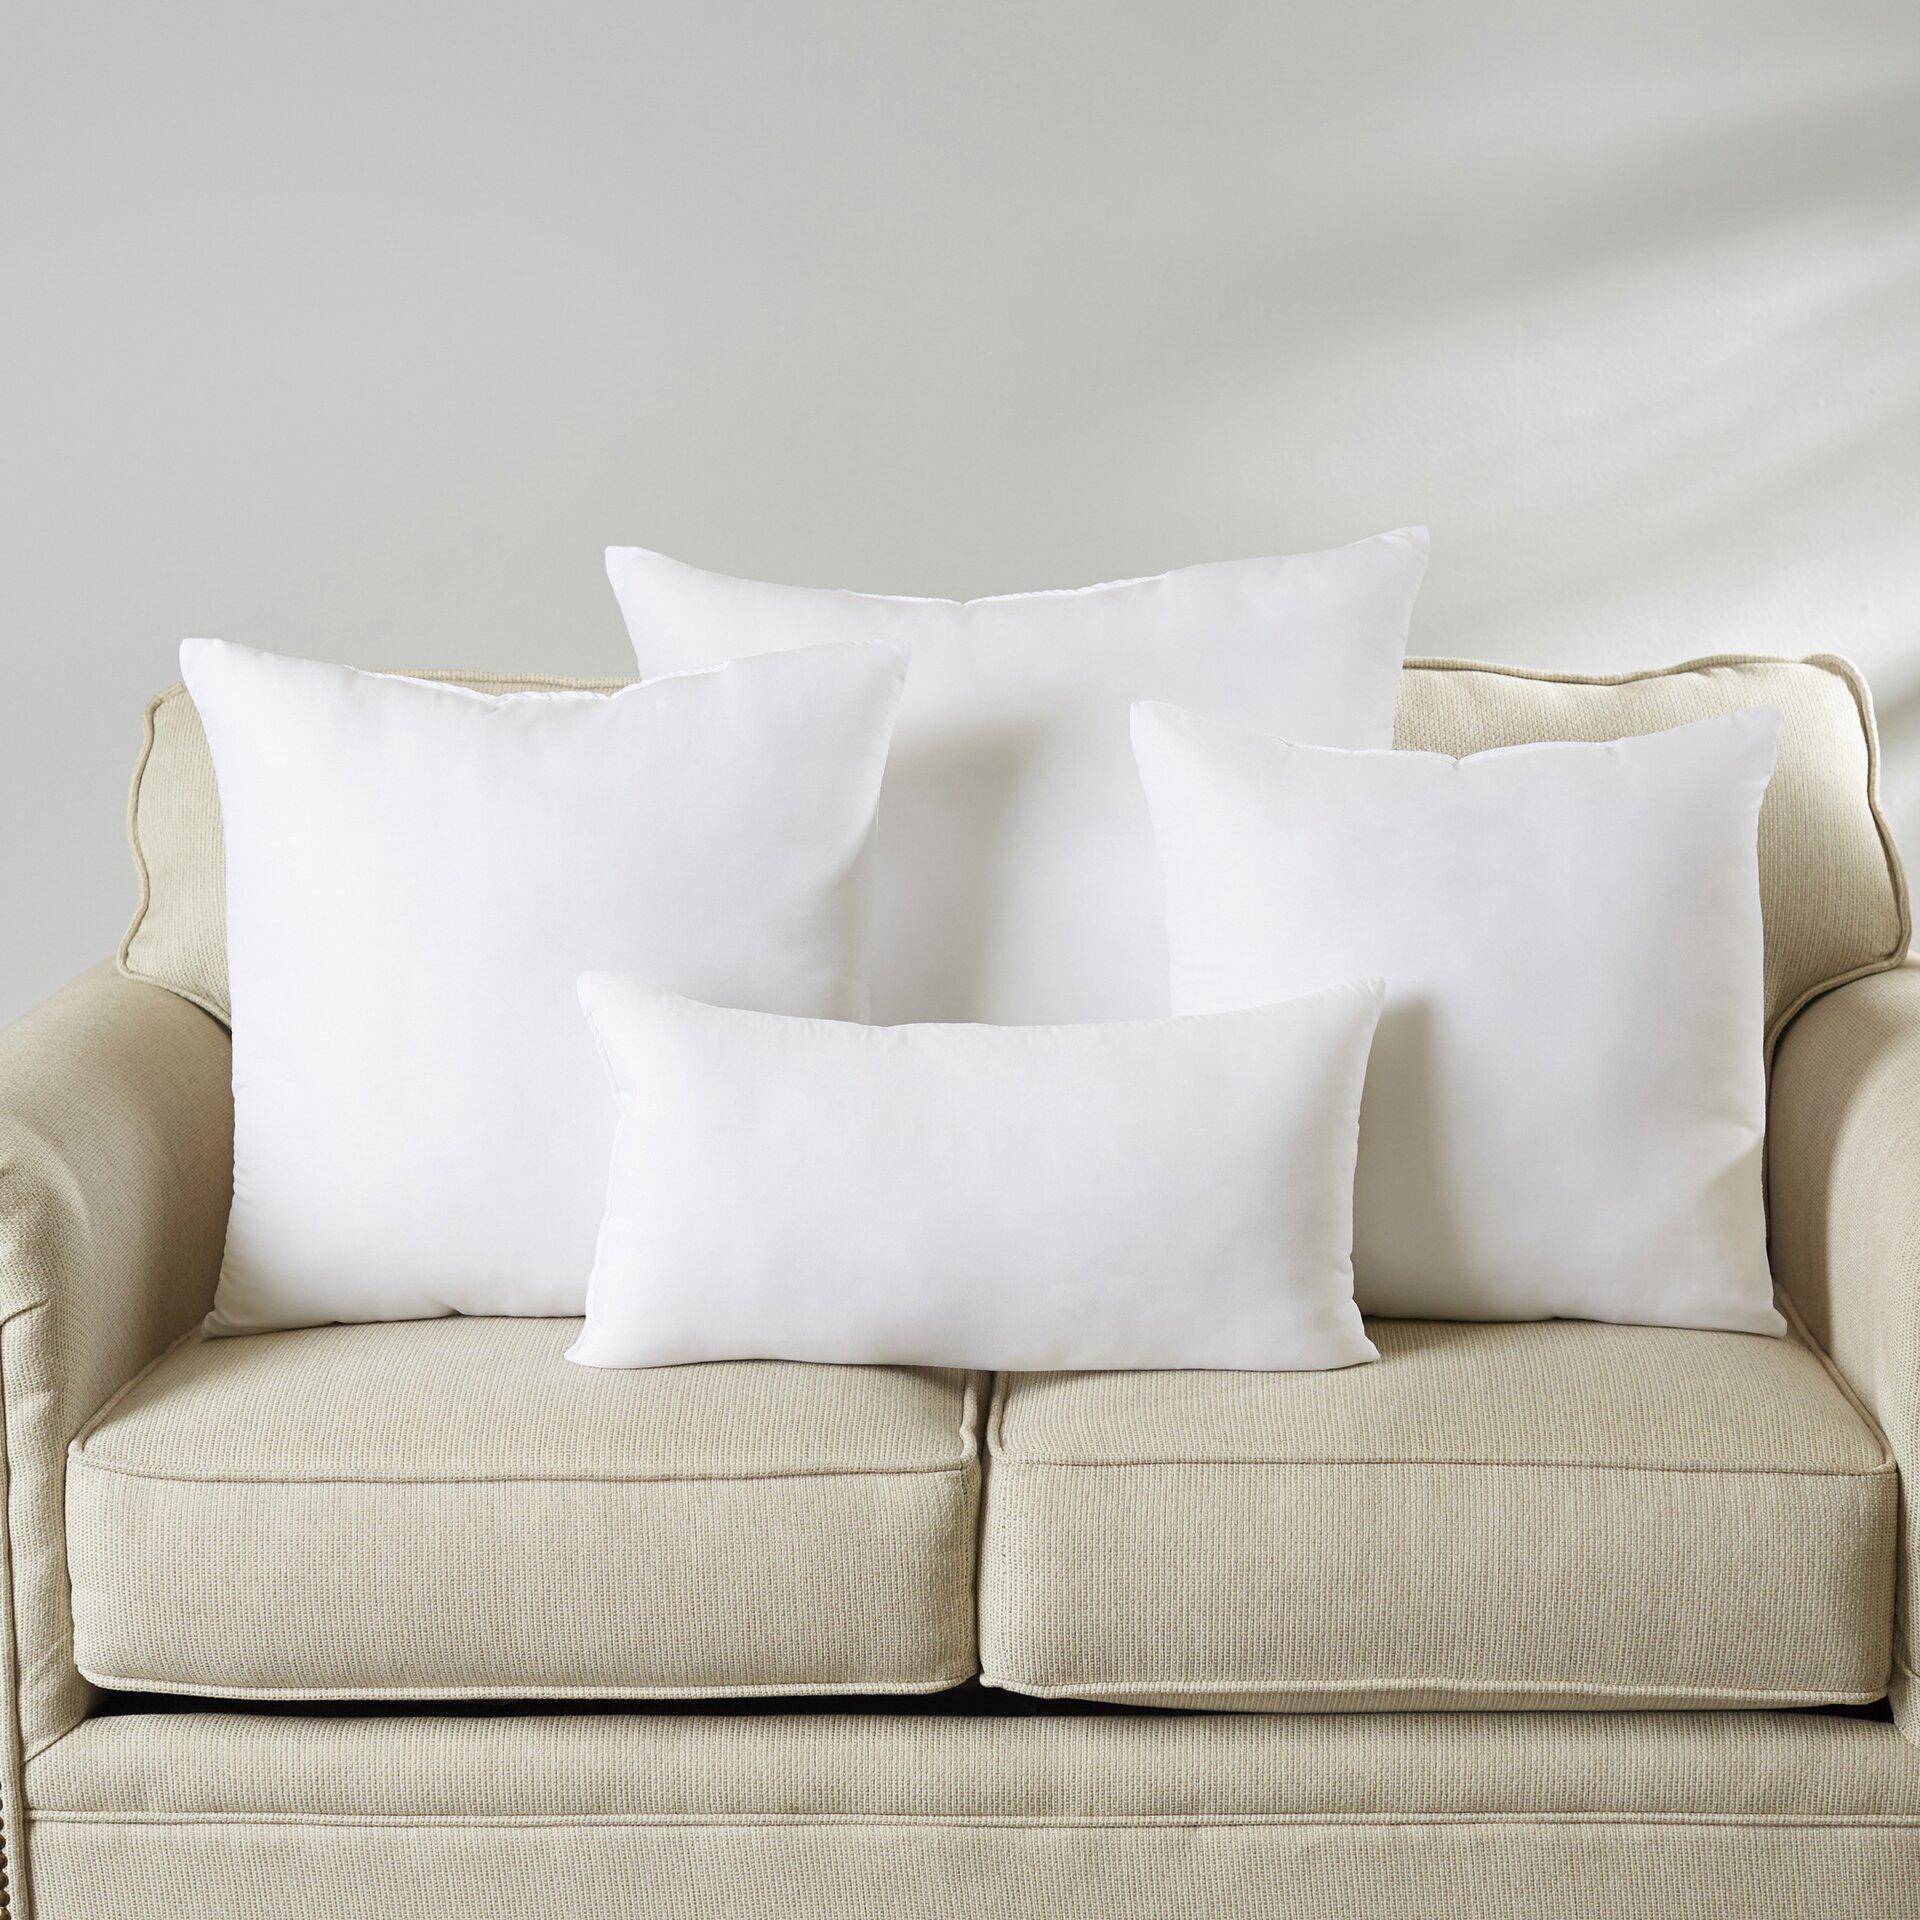 Wayfair Basics Wayfair Basics Throw Pillow Insert